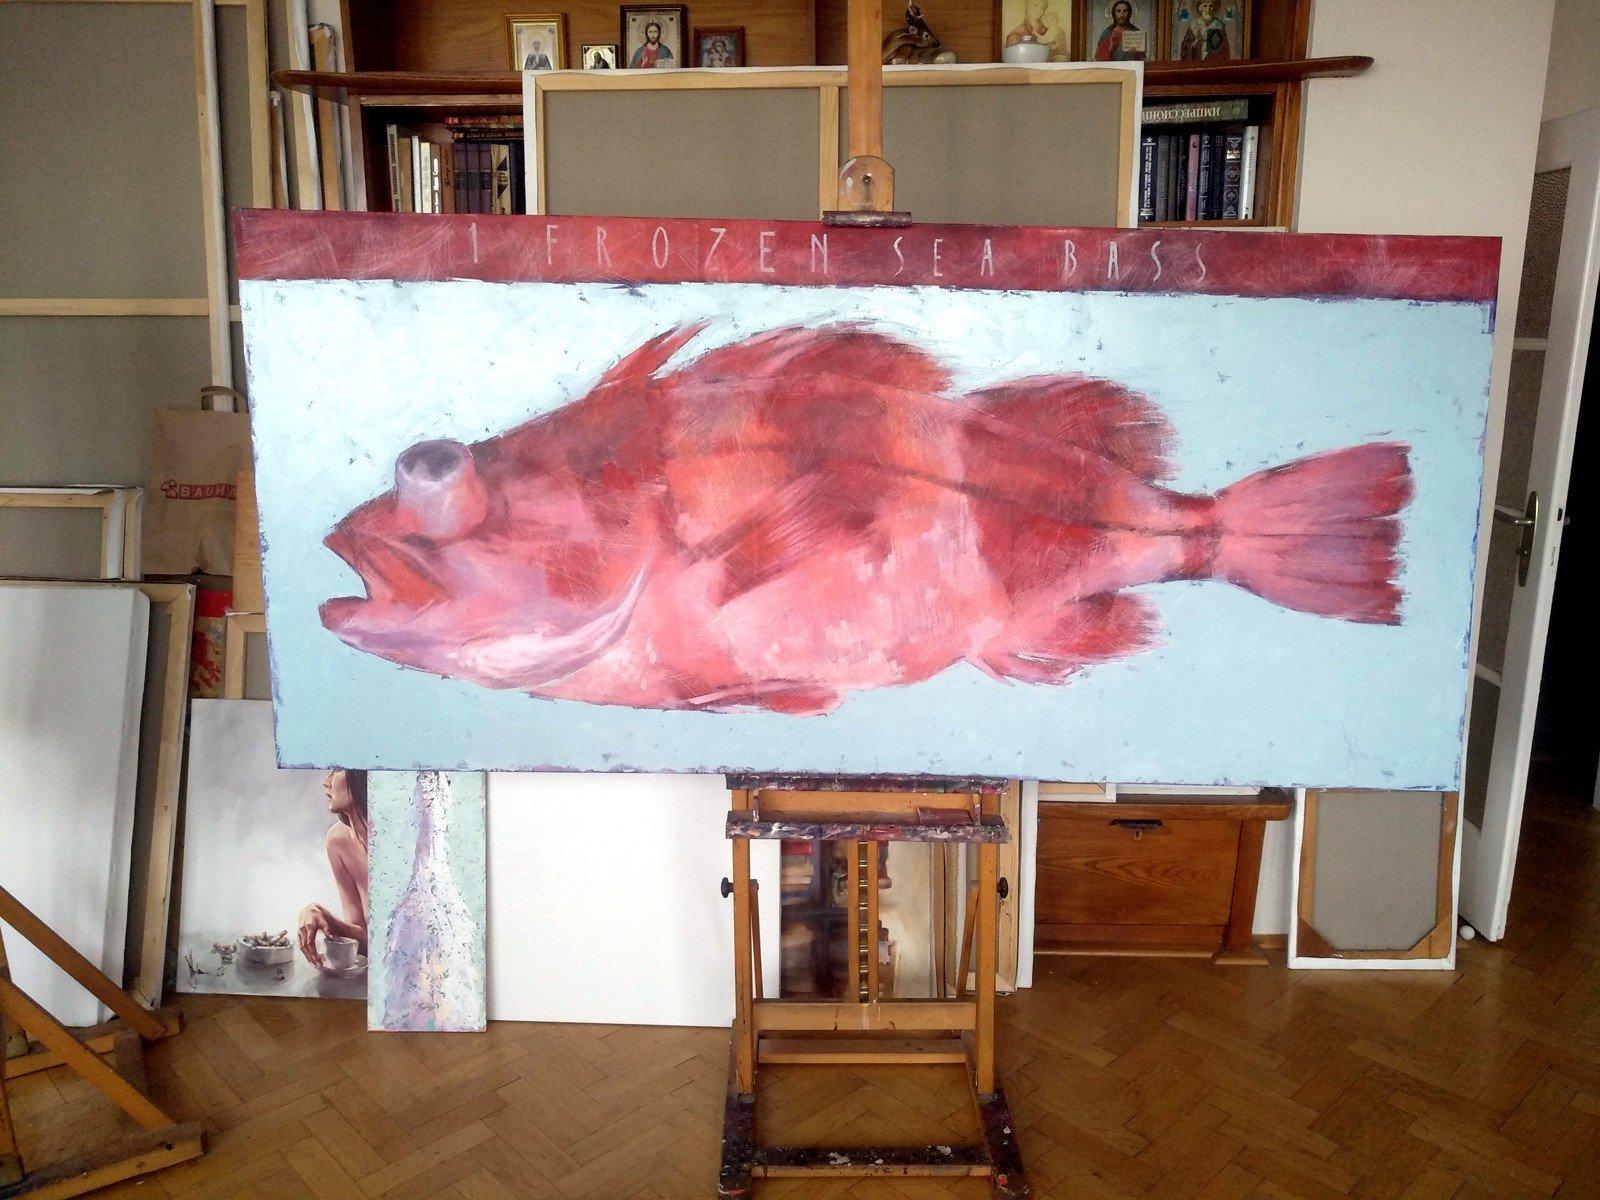 Big 1 Frozen Sea Bass painting upcoming